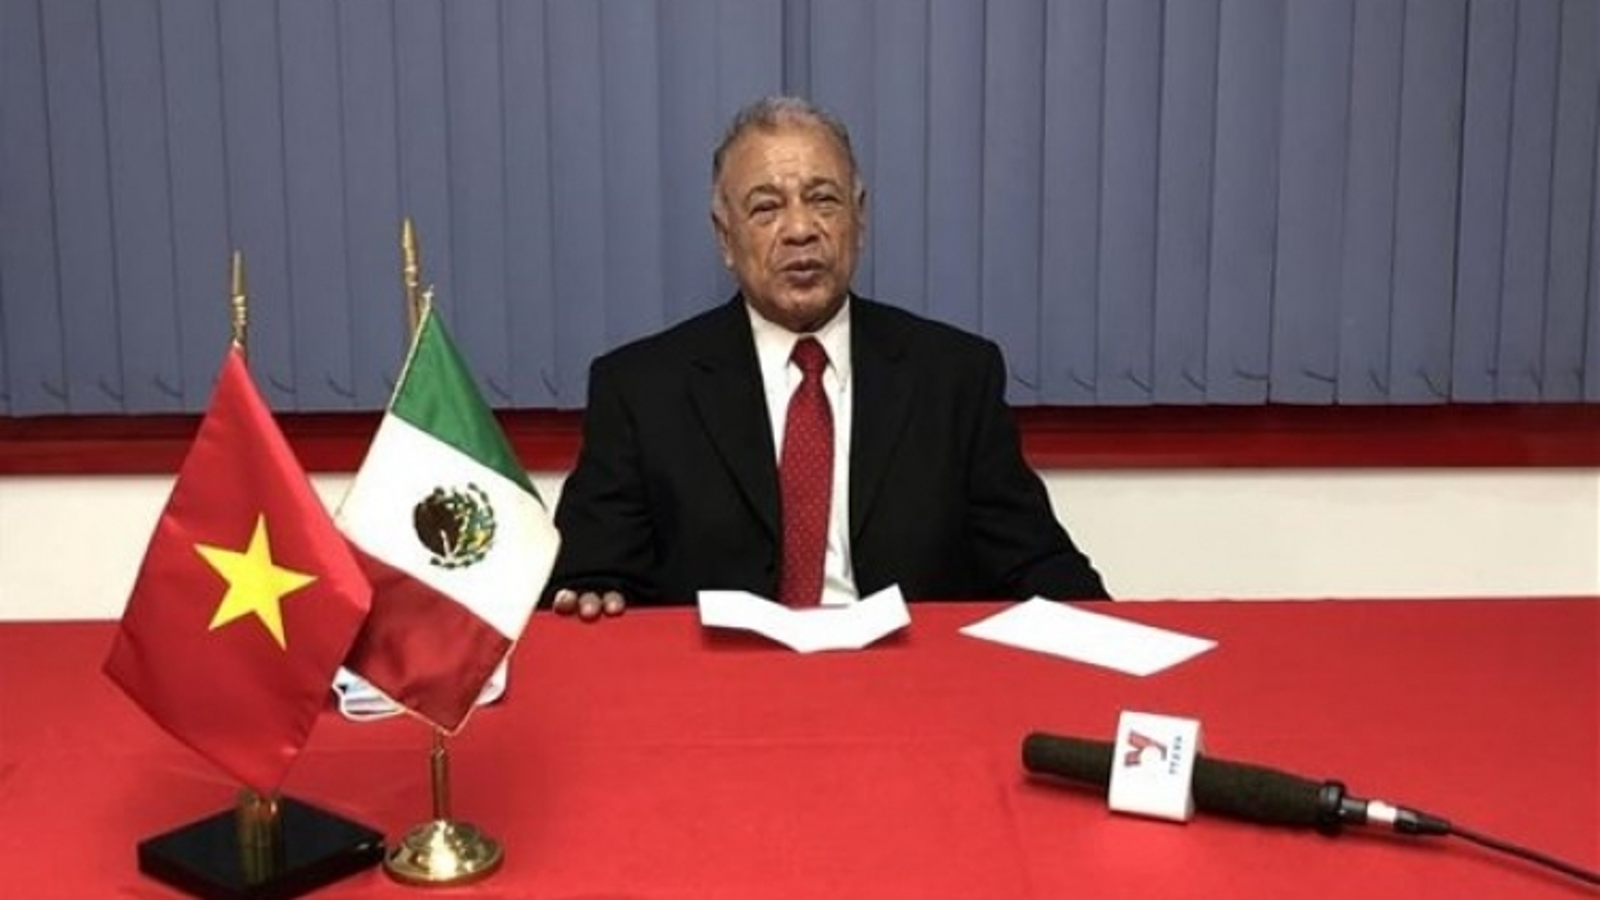 Mexican Labour Party's leader hails socialism building as CPV's sound decision